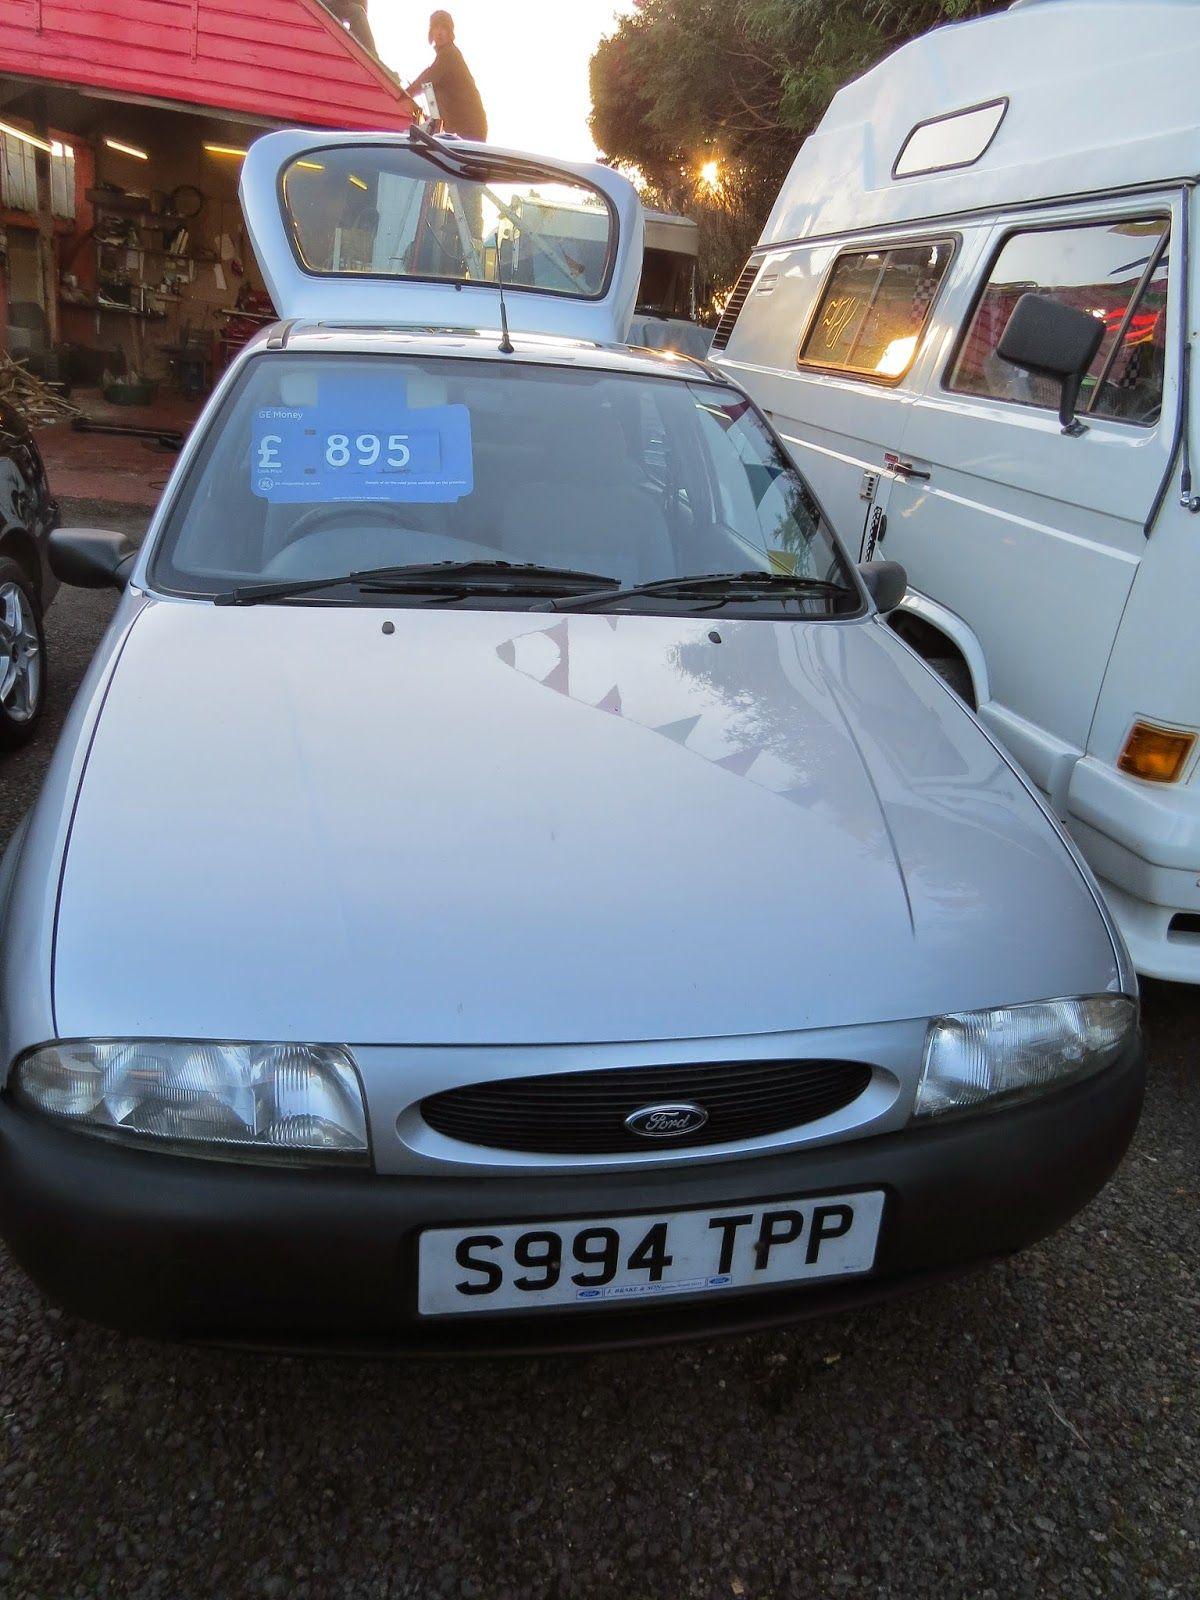 Http www granbycars co uk ford